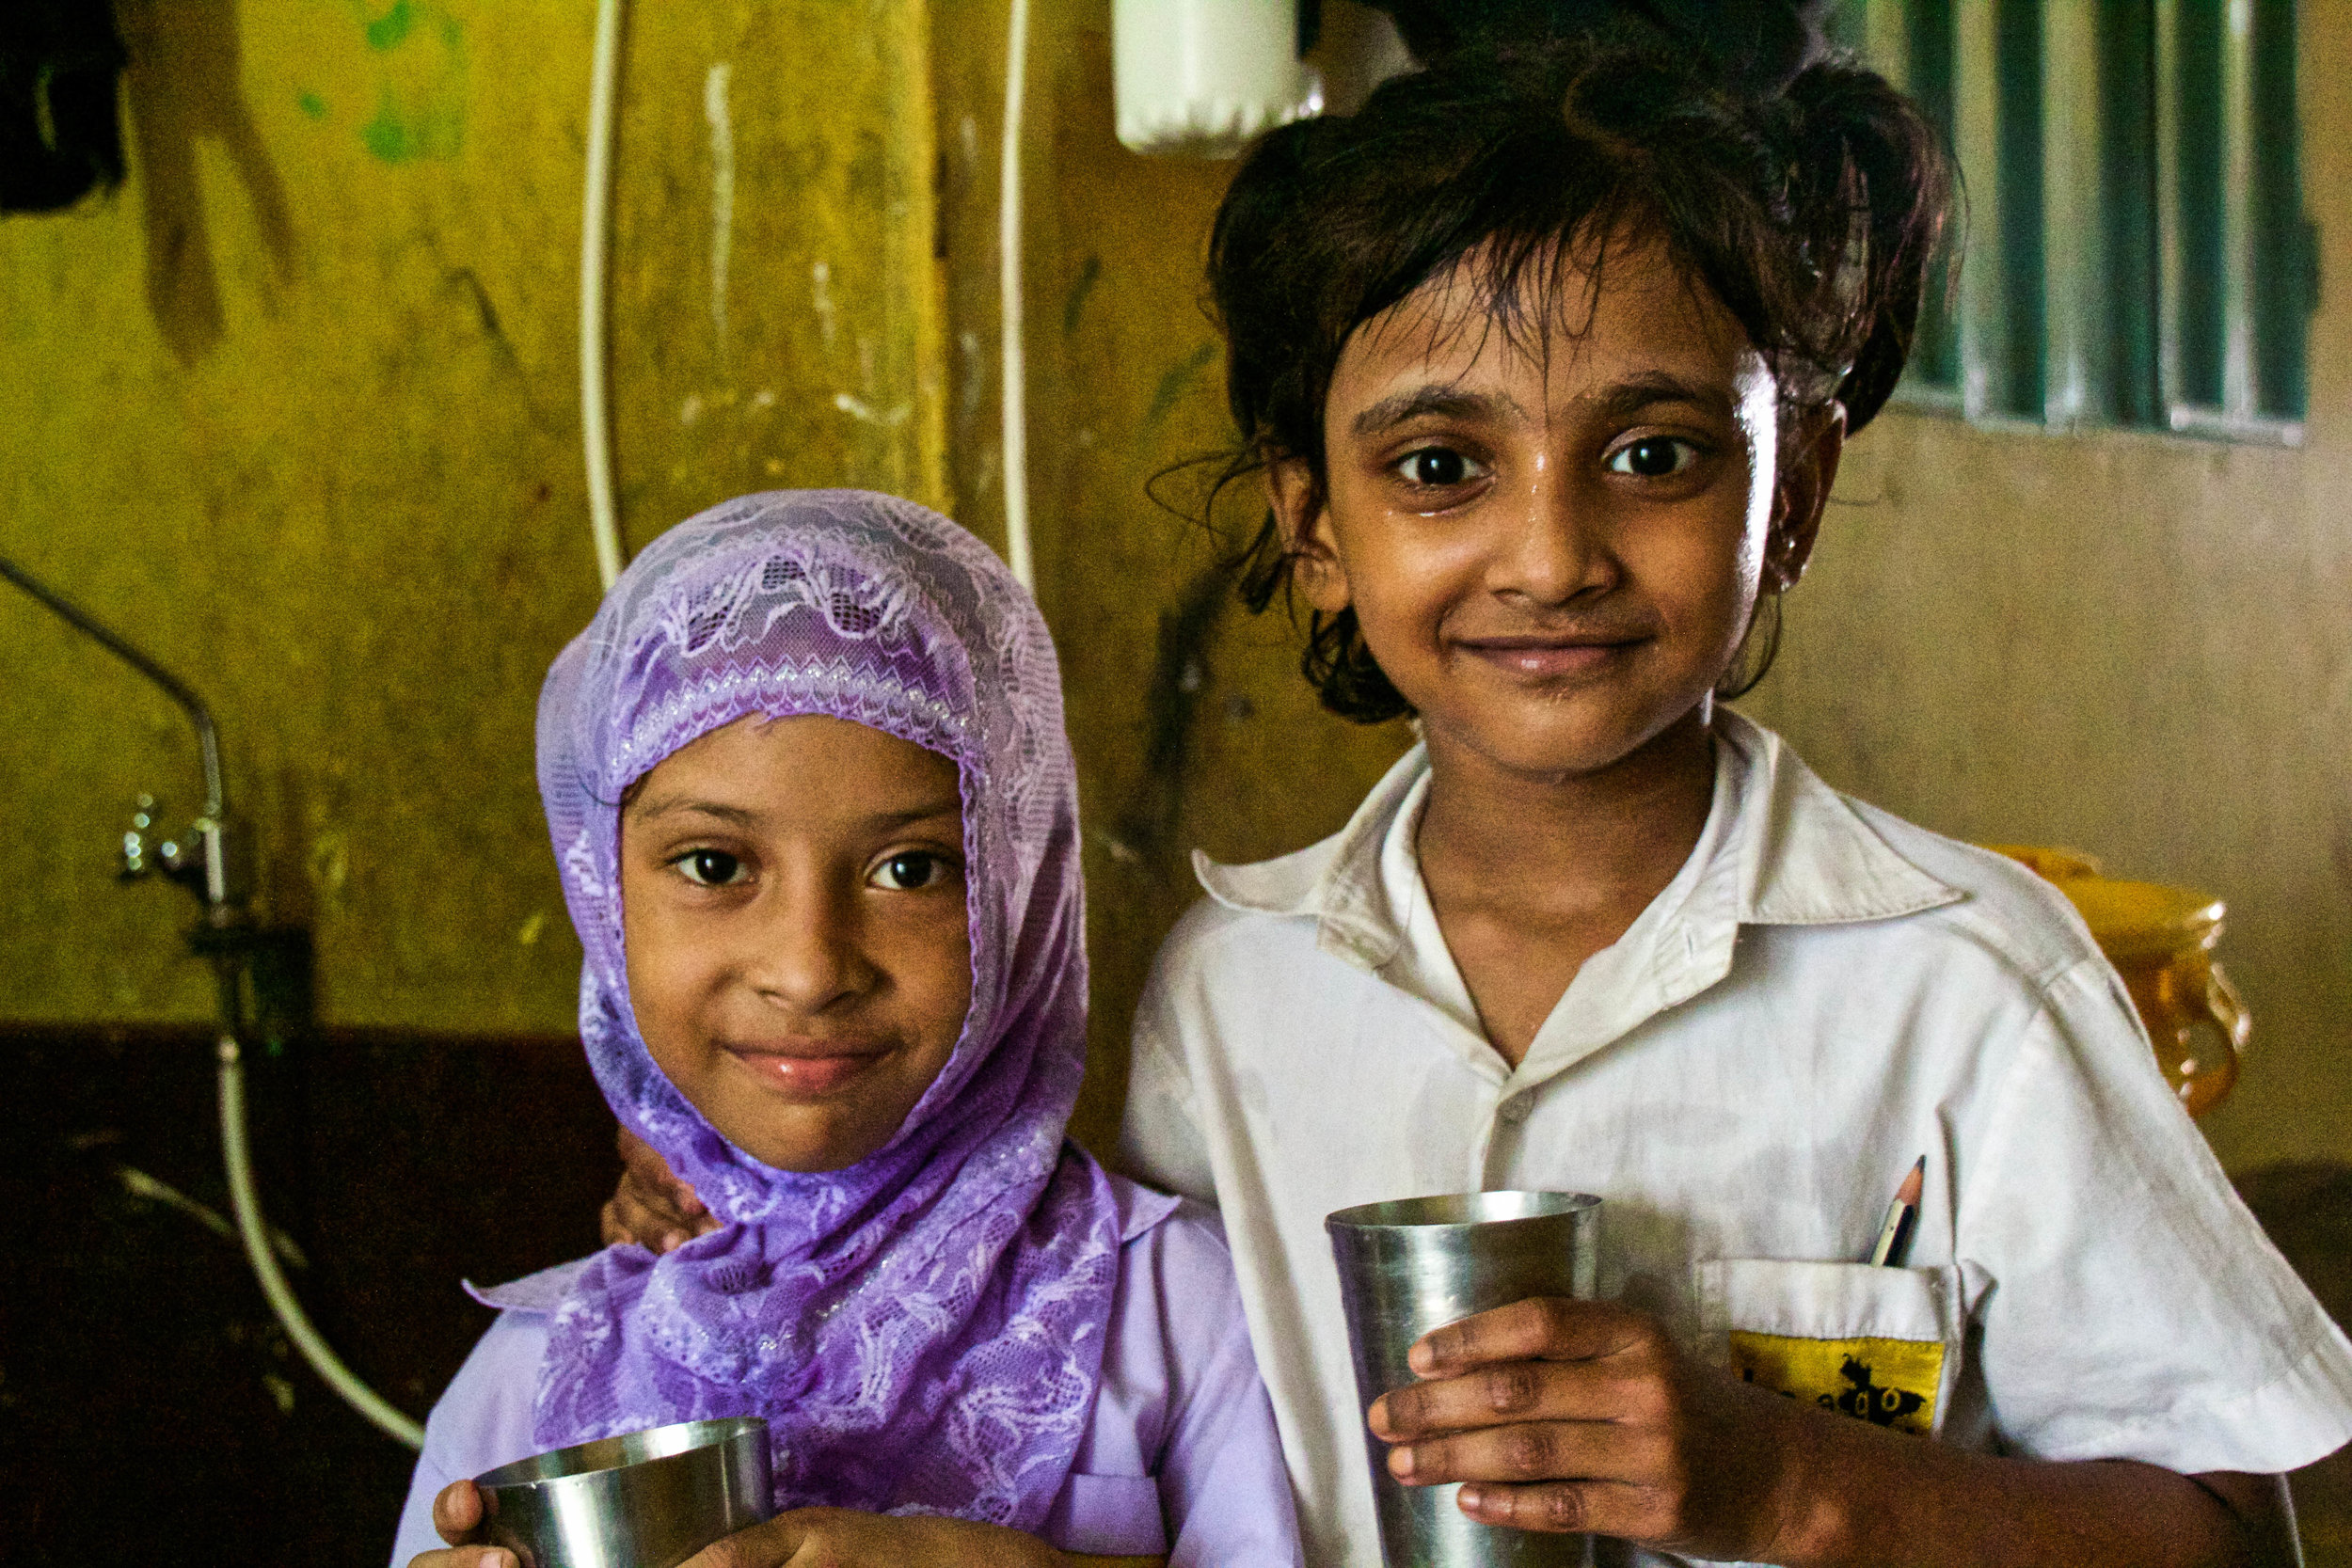 dhaka bangladesh jaago school children-29-9.jpg